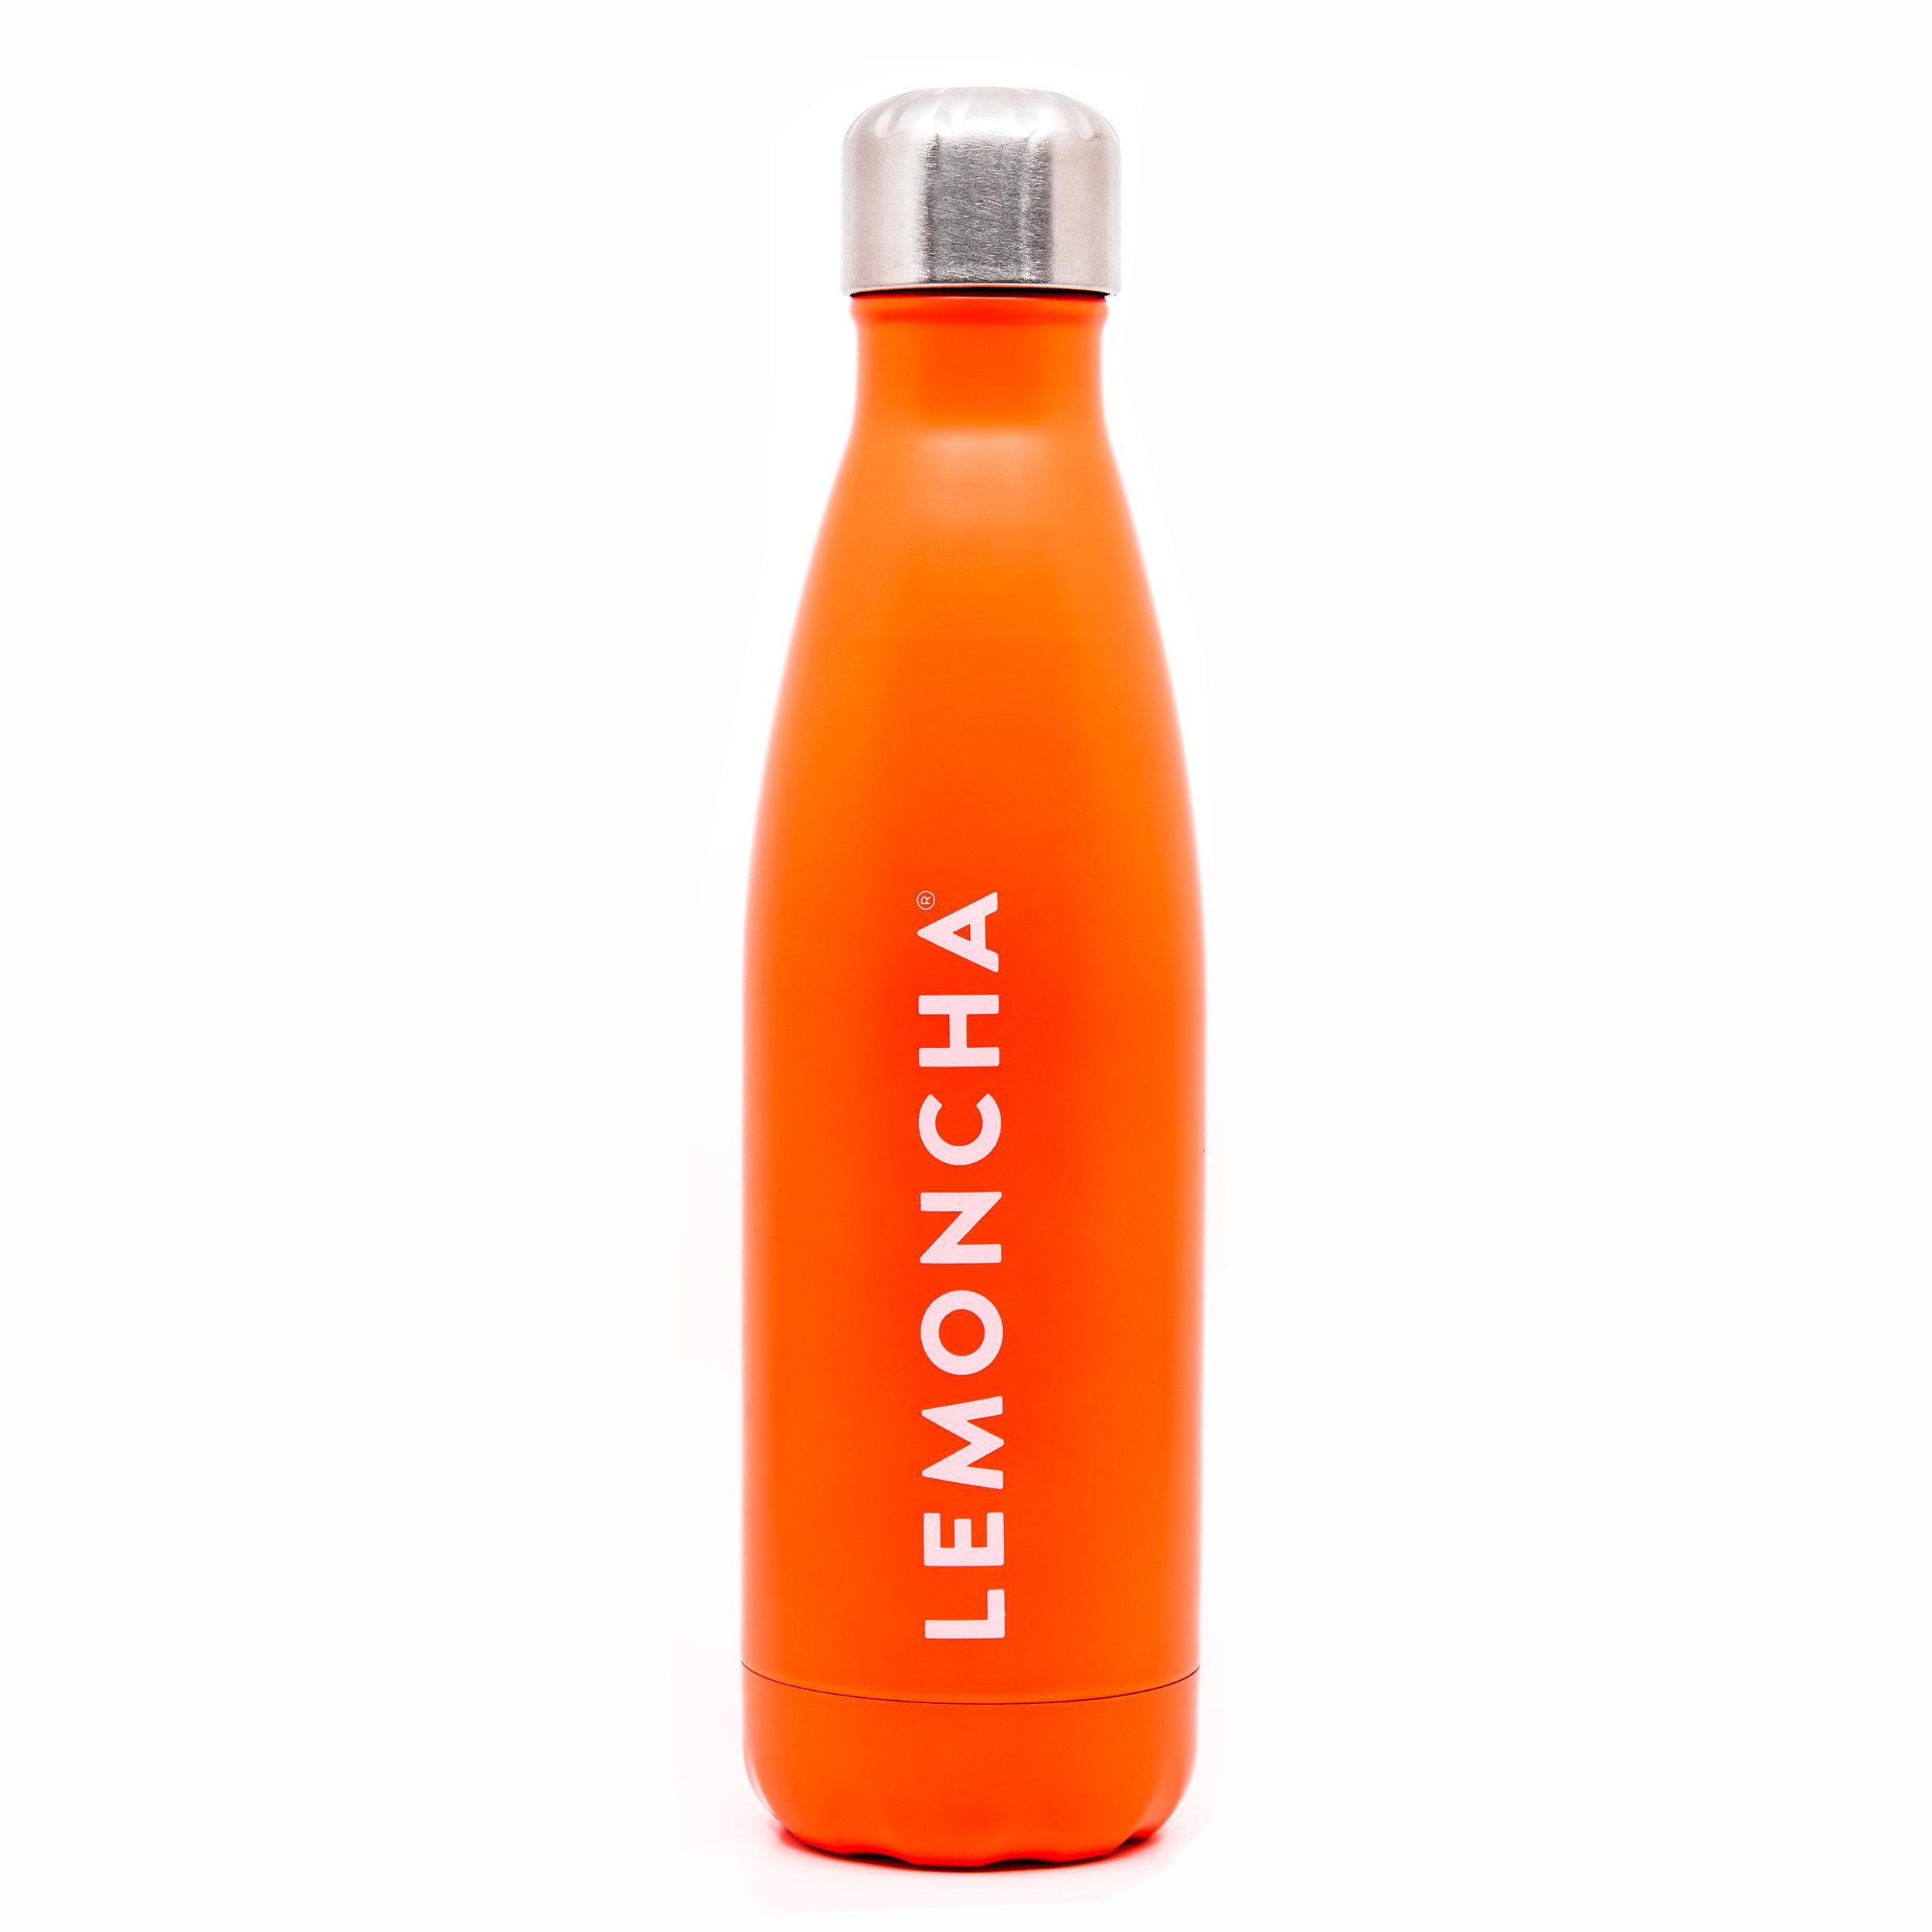 Lemoncha Tangerine Bottle Limited Edition